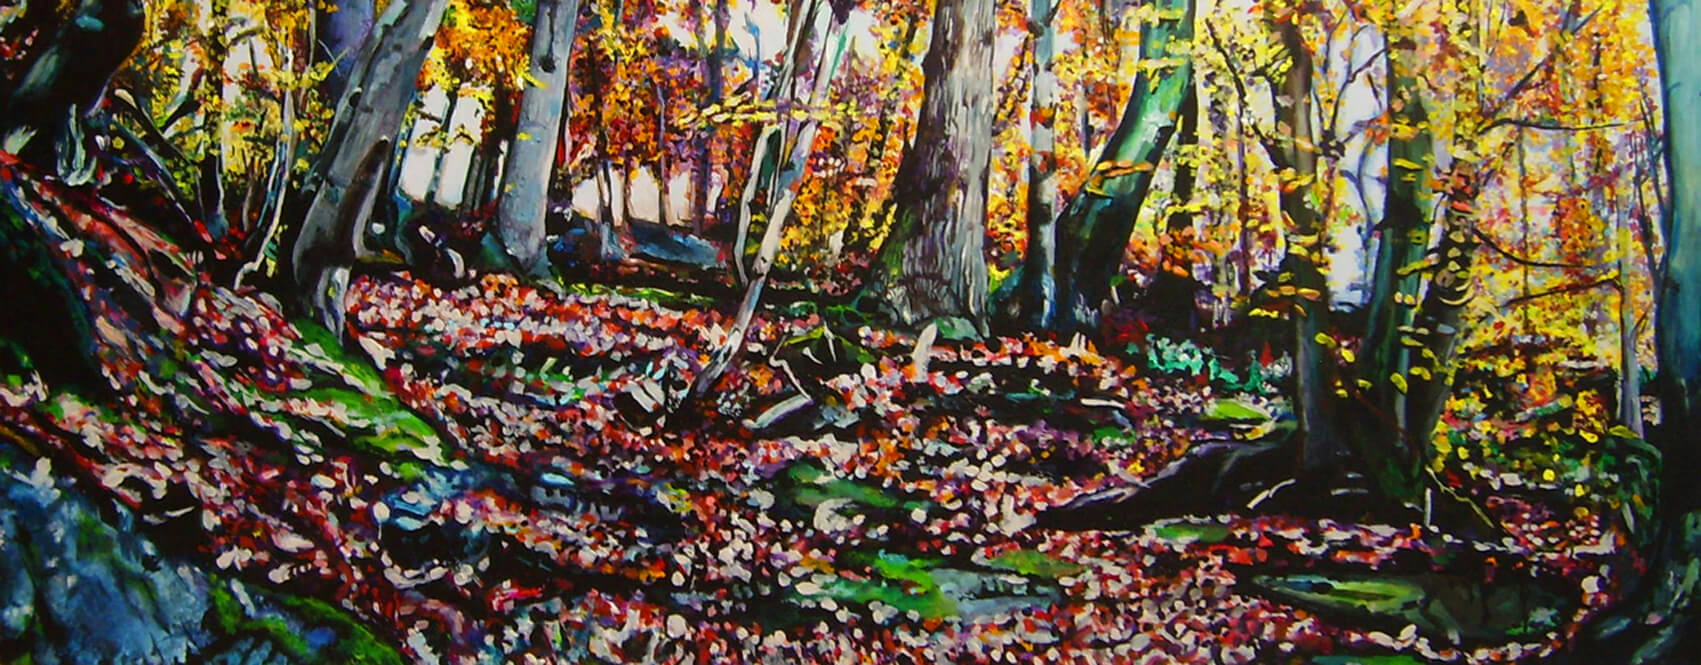 Zauberberg, Acryl auf Leinwand, 50x100x4 cm, 2010, 1300 Euro, verkauft.